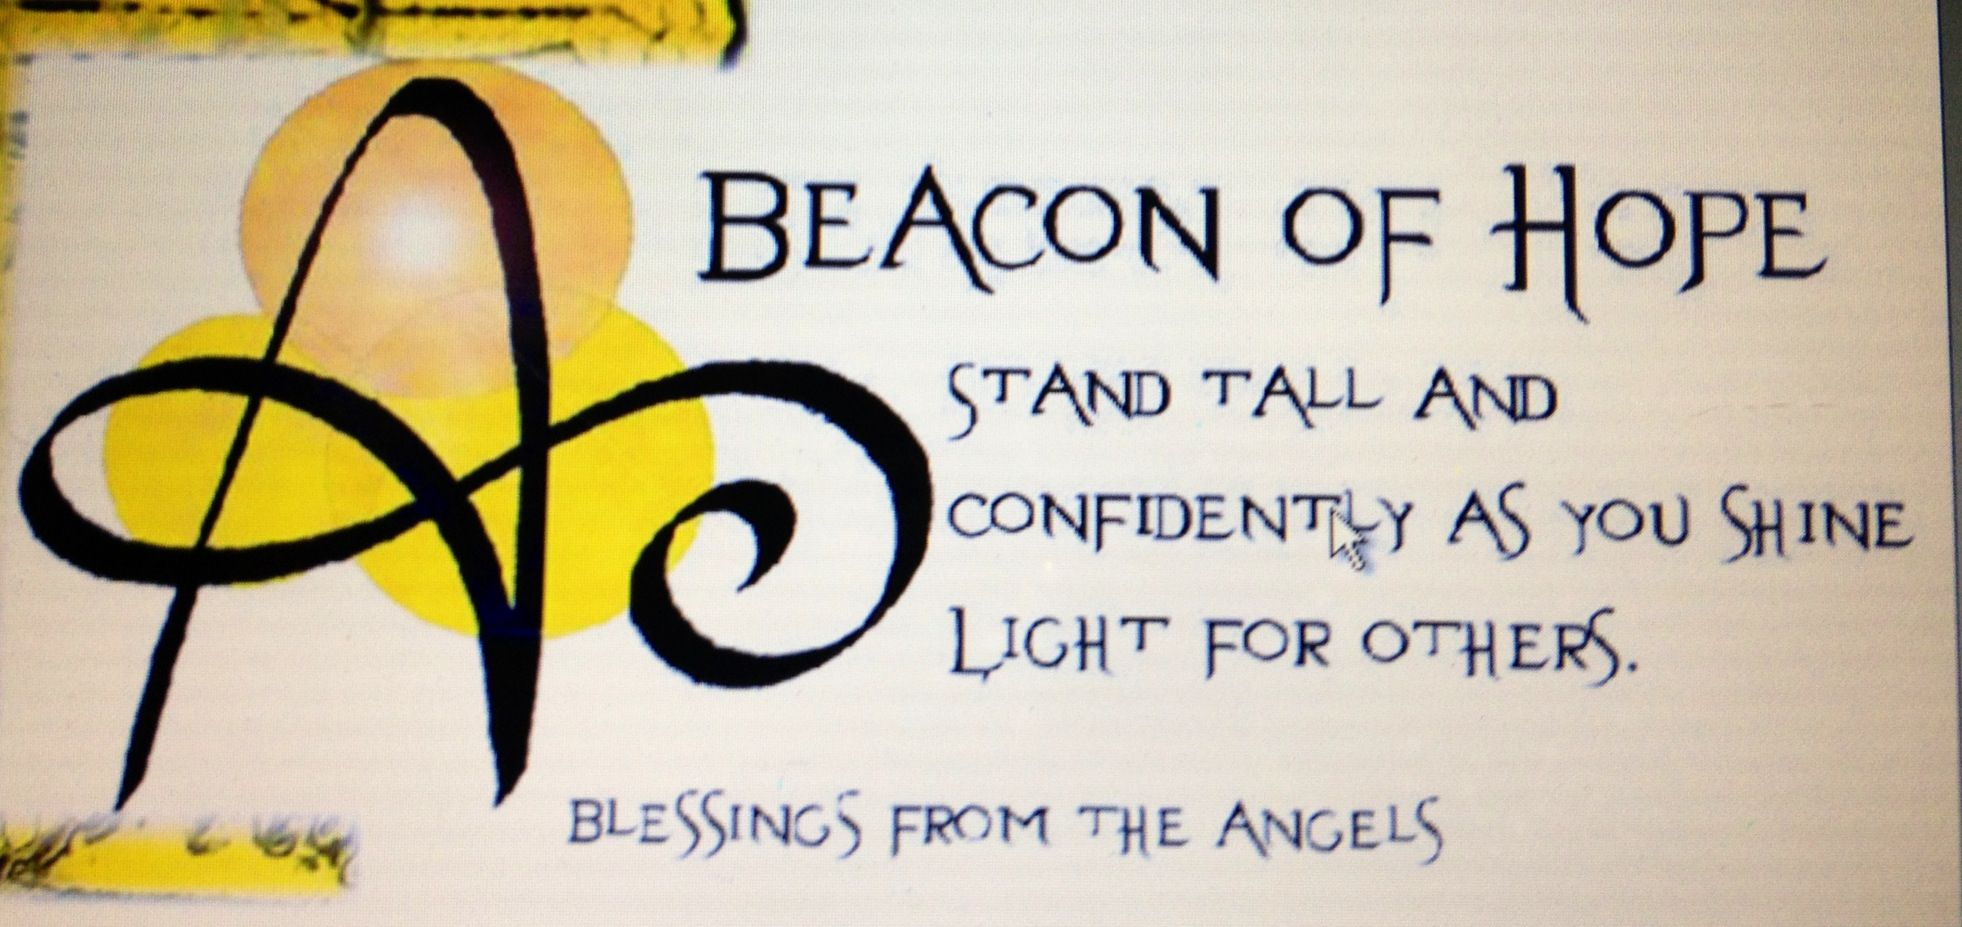 Angel symbol beacon of hope tattoos pinterest angel symbol beacon of hope biocorpaavc Image collections